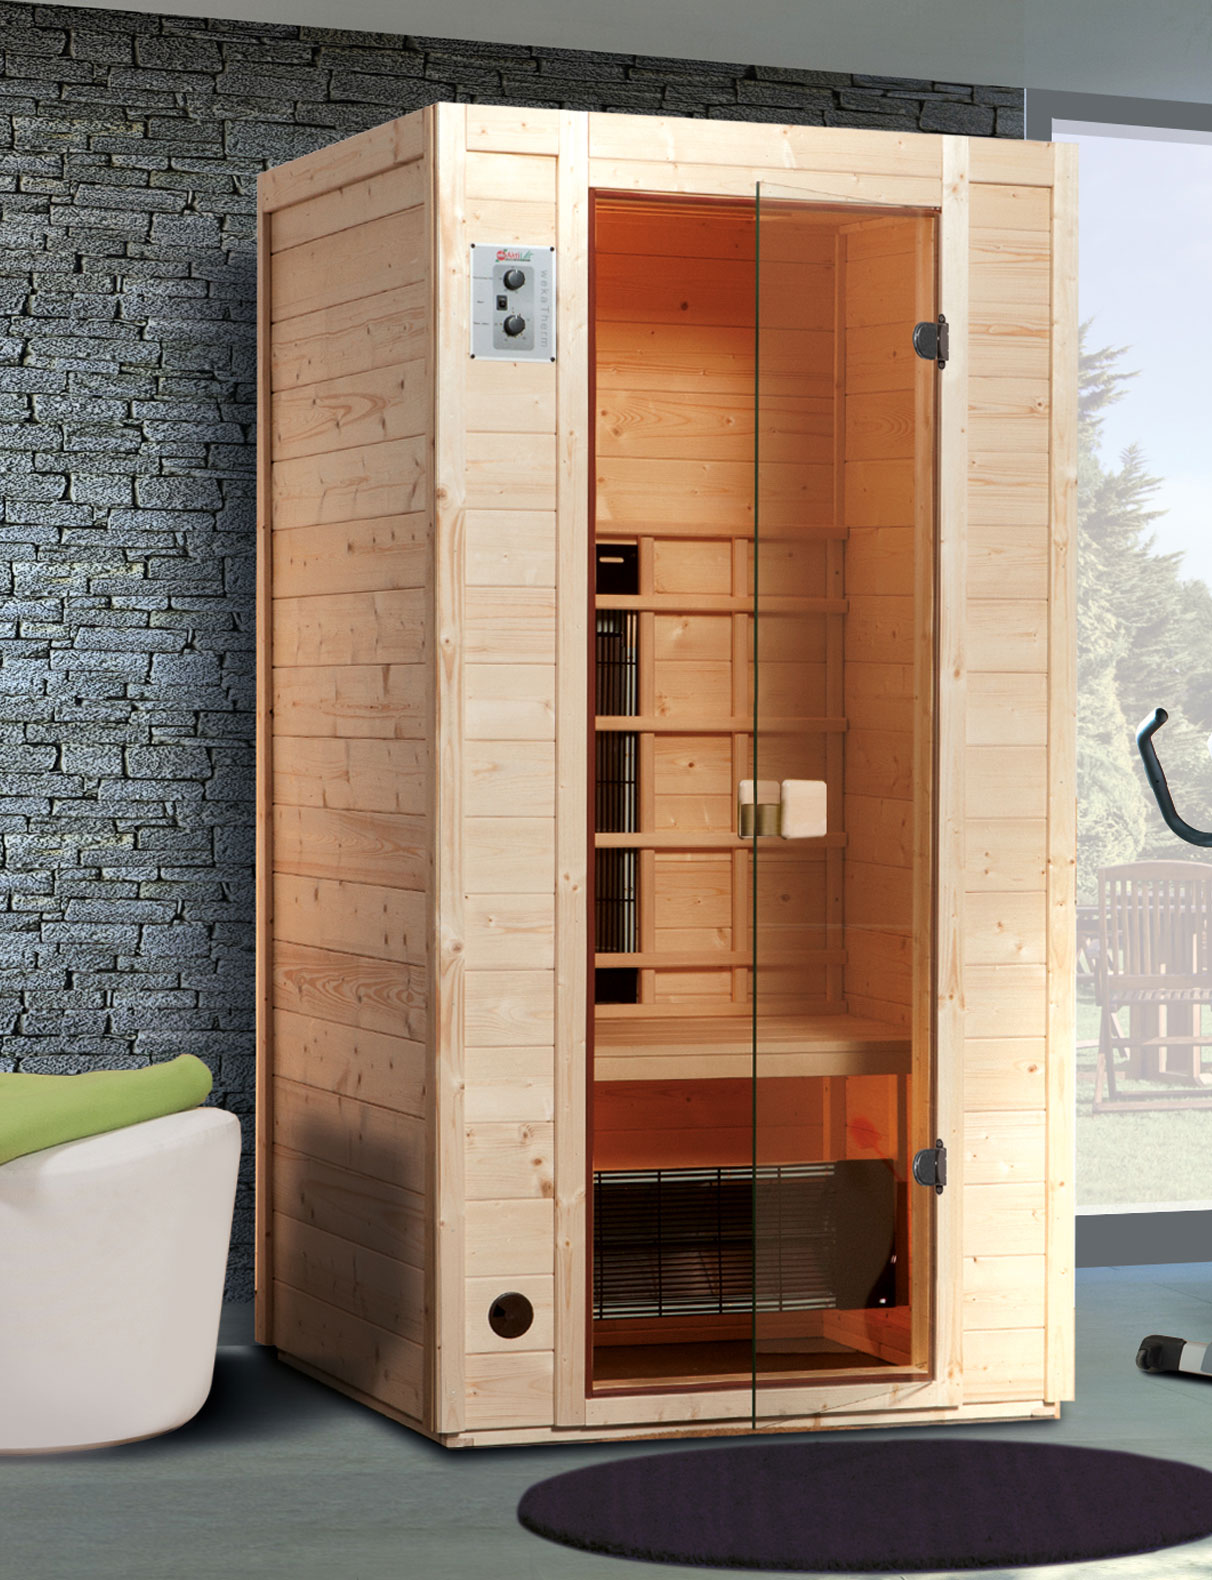 weka w rmekabine infrarotkabine 550 gr 1 mit keramikstrahler bild 1. Black Bedroom Furniture Sets. Home Design Ideas